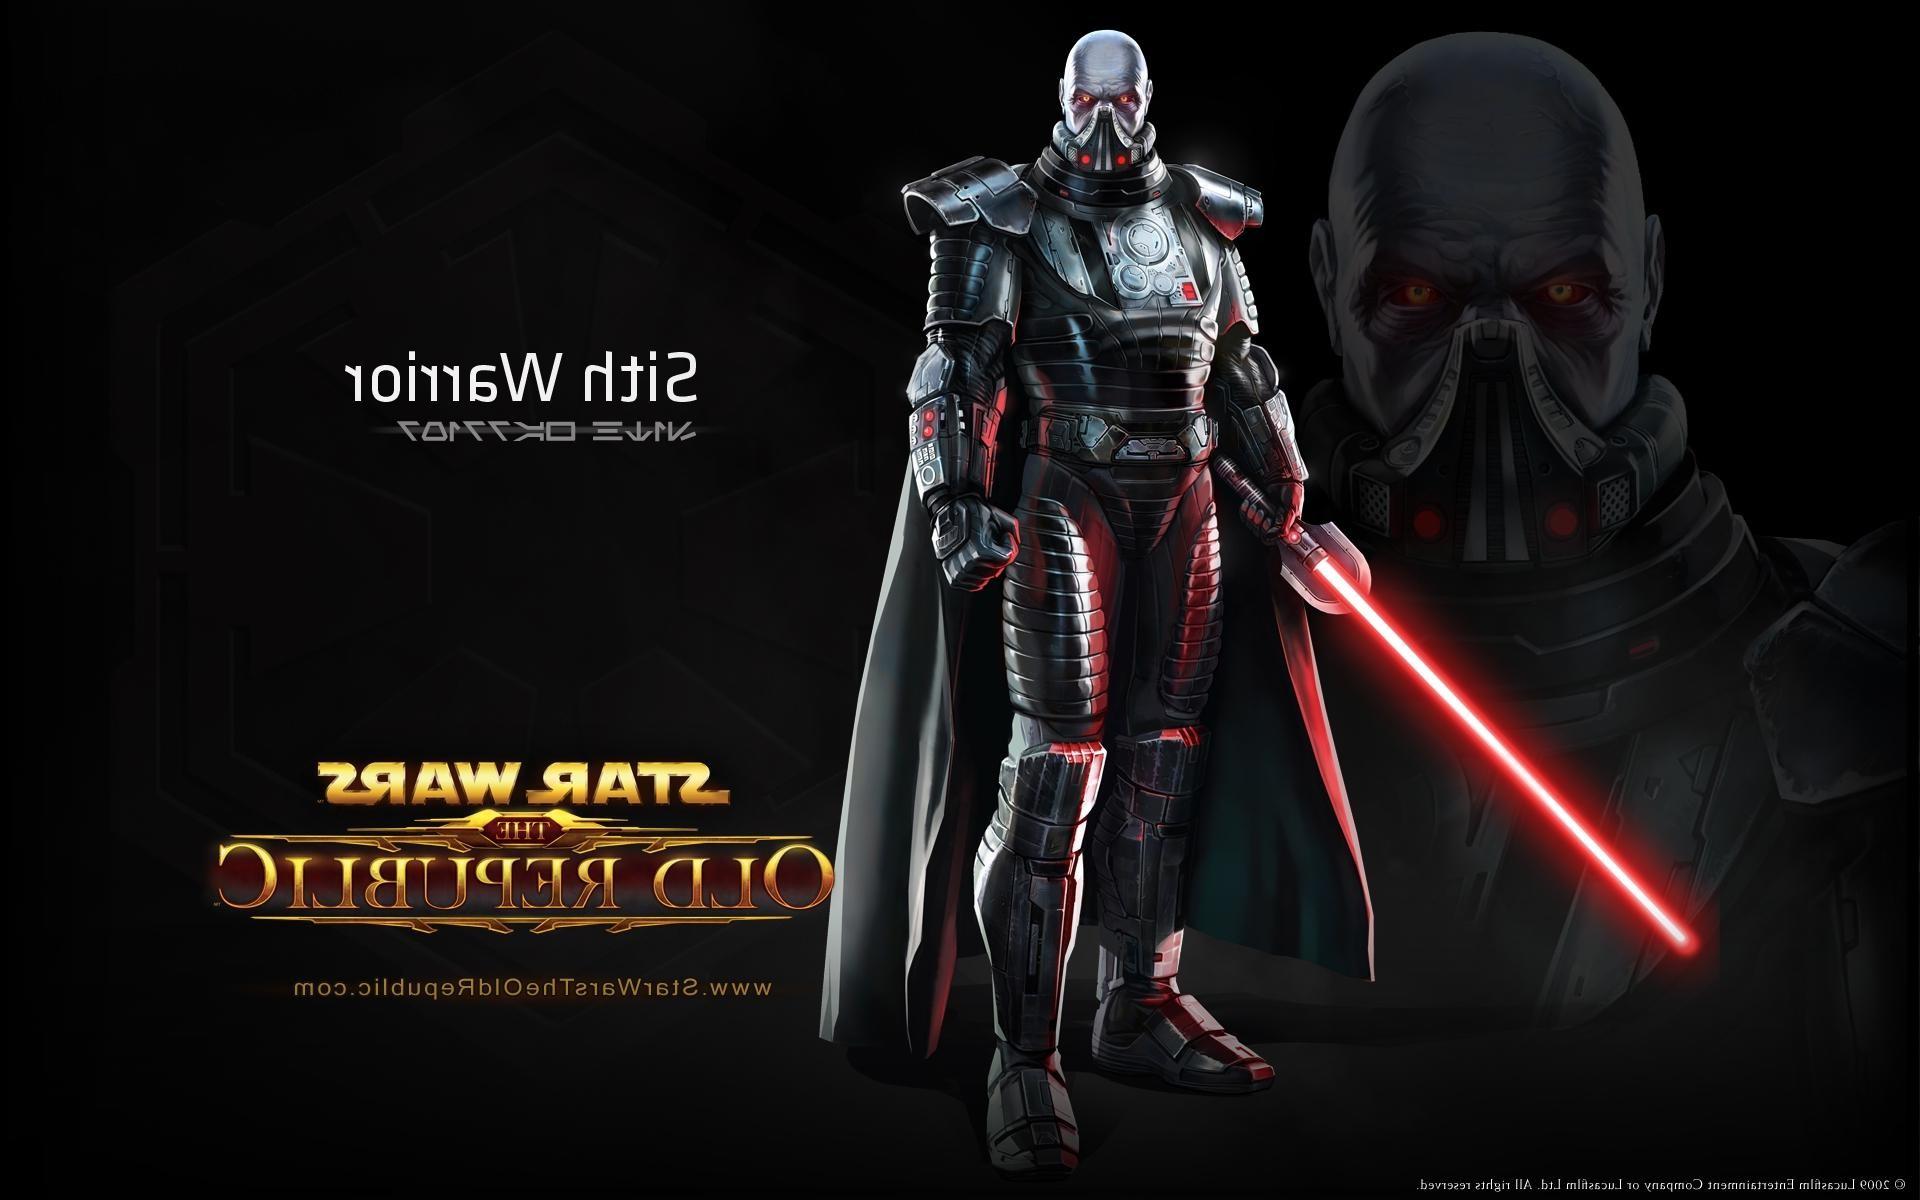 Star Wars The Old Republic Sith Warrior #aQc